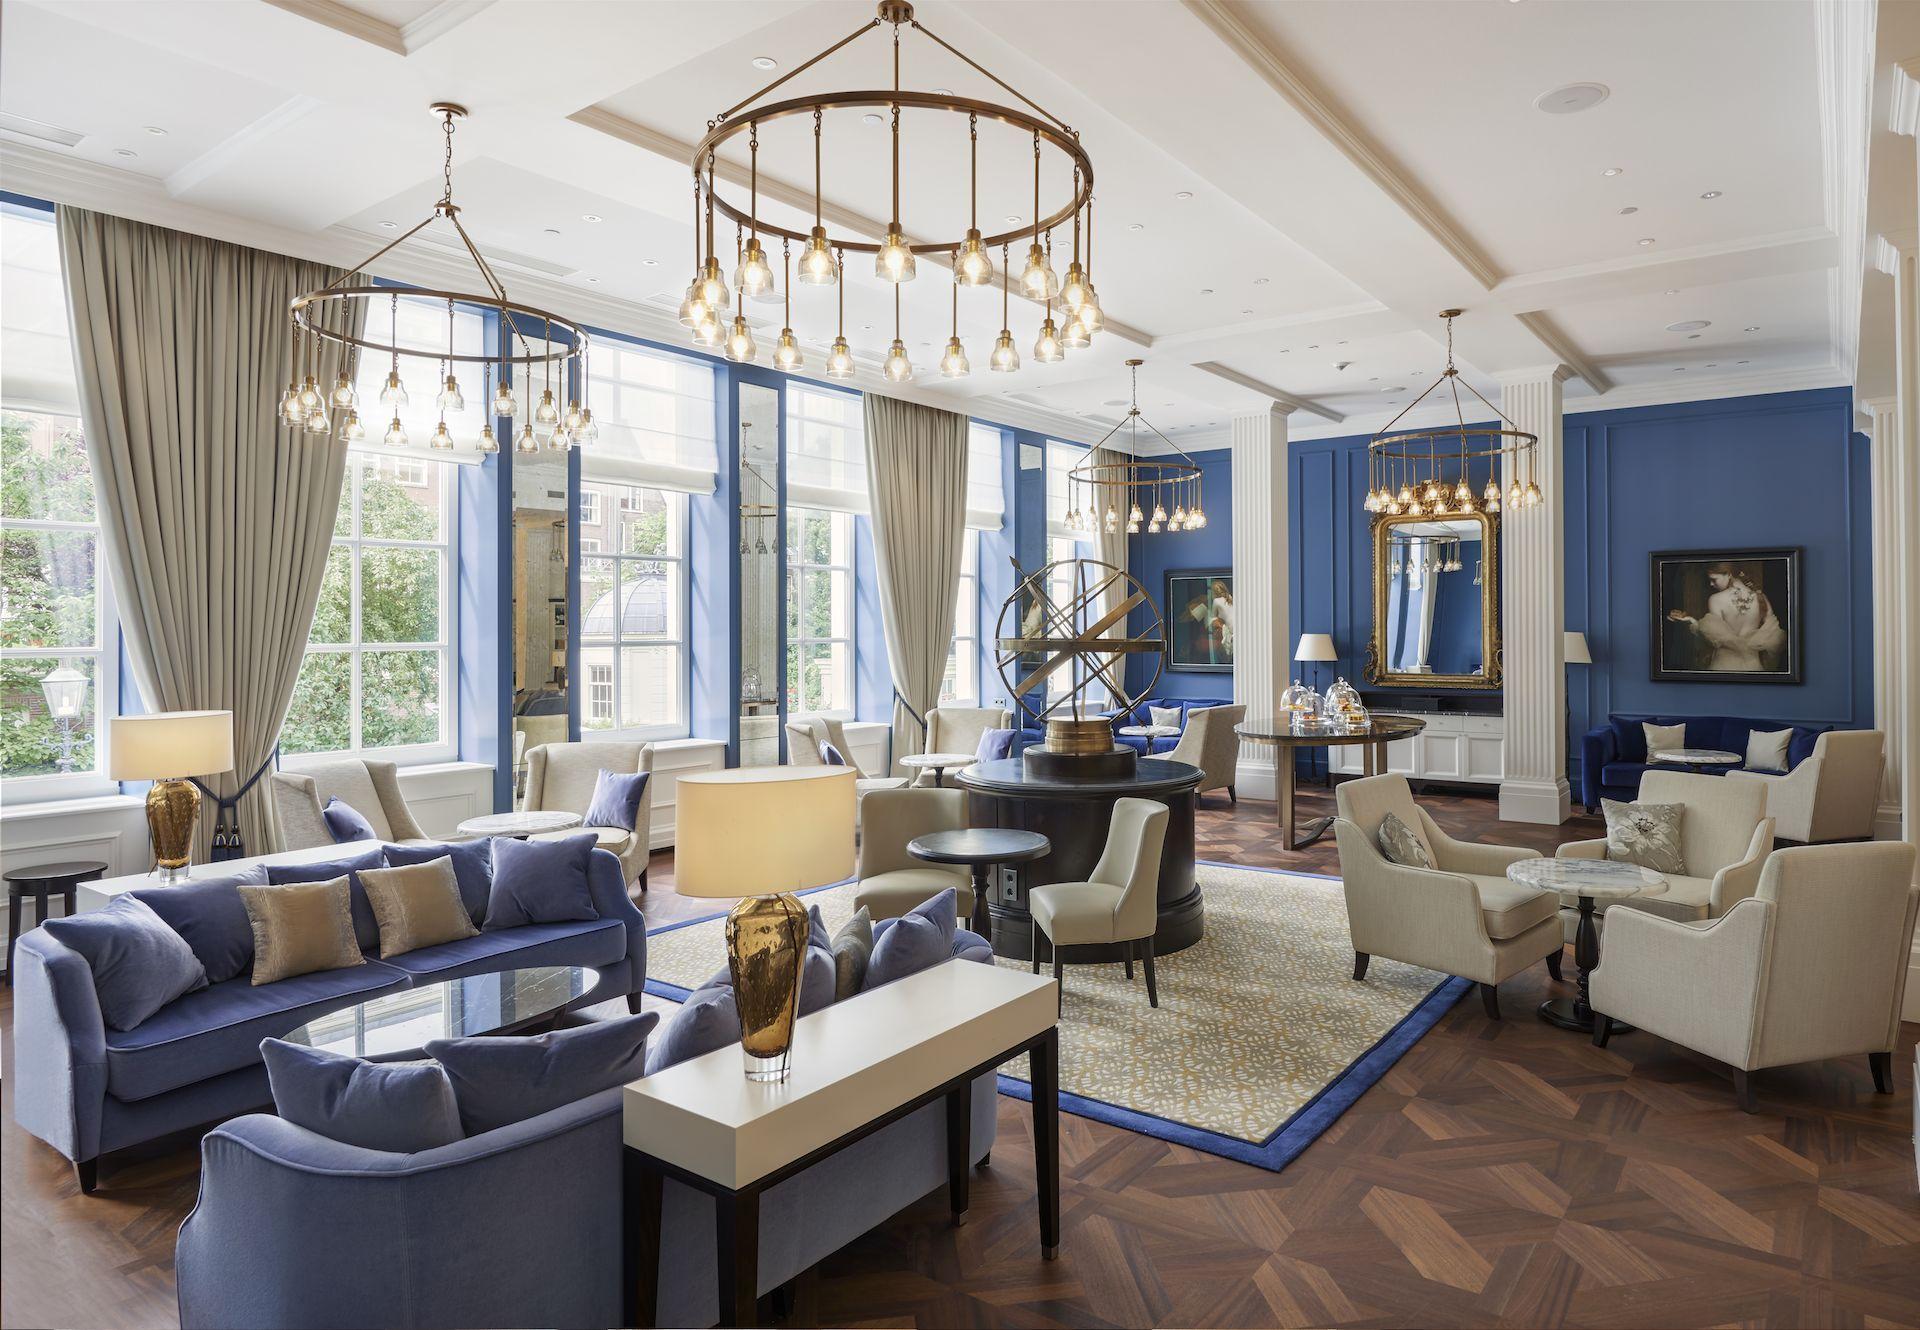 G A Design Luxury Interior And Architectural Design Waldorf